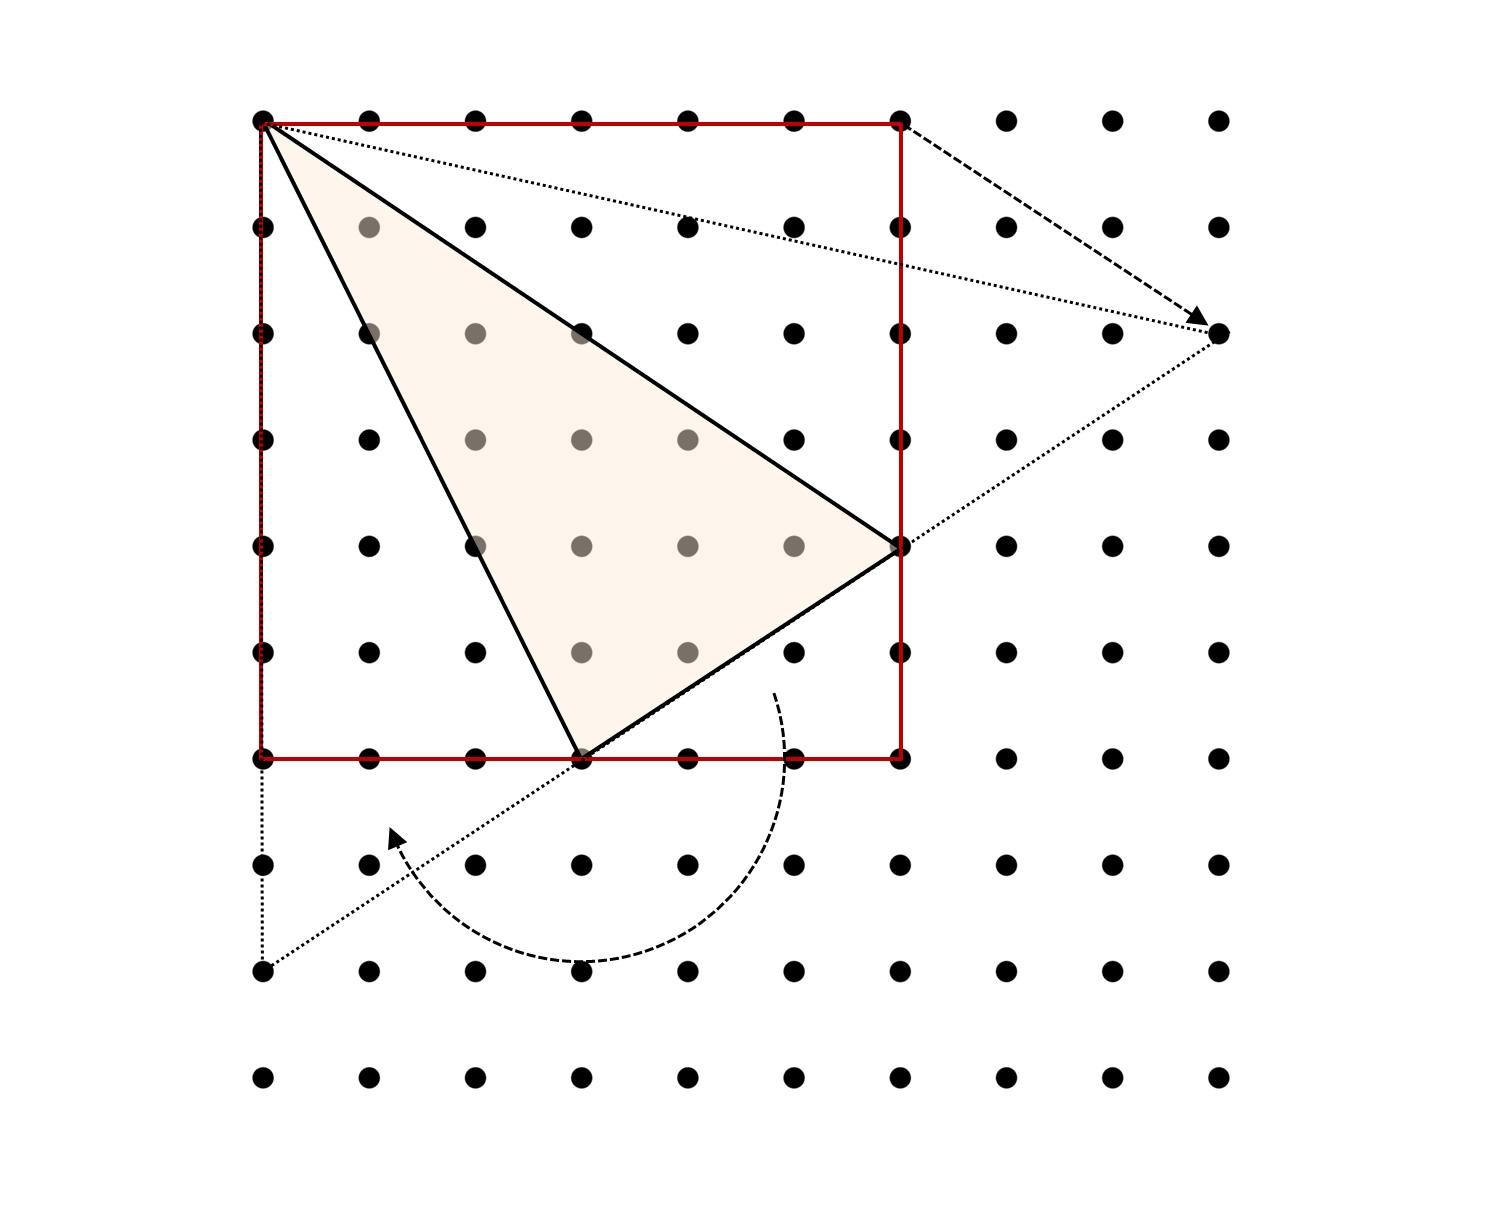 median don steward mathematics teaching  triangles inside squares